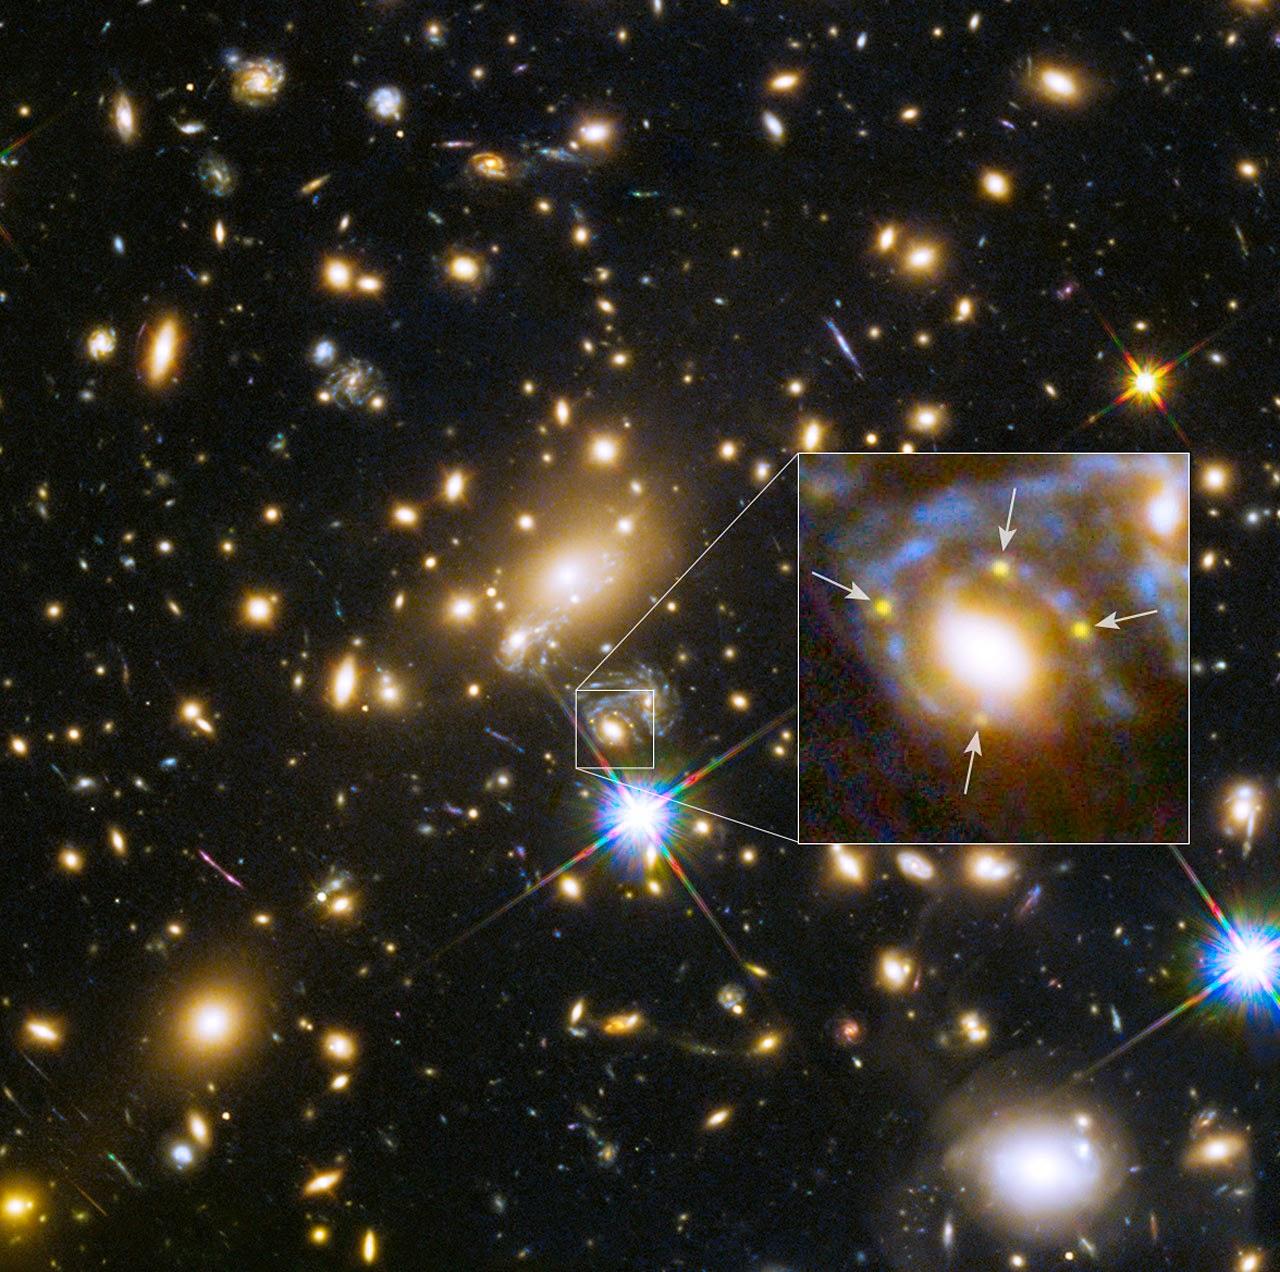 exploding supernova hubble telescope - photo #22